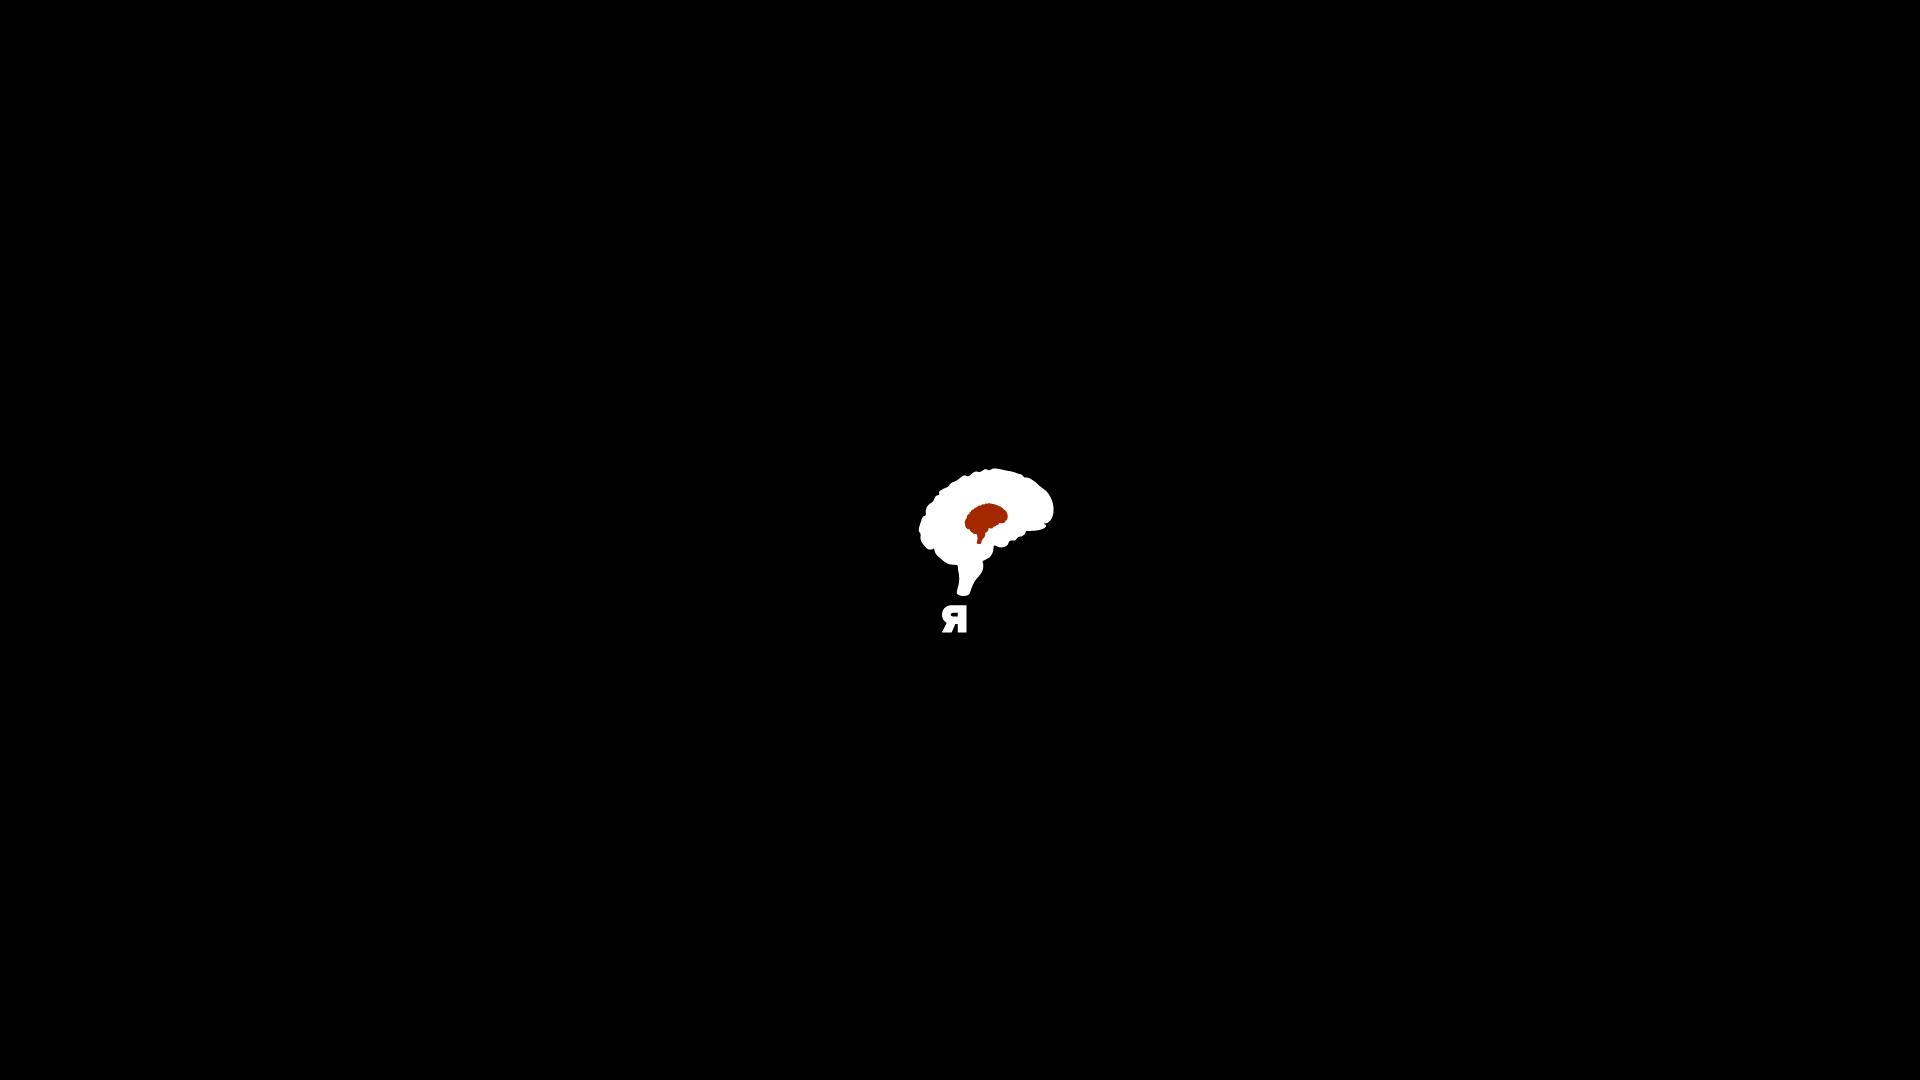 Разработать логотип для Онлайн-школы и сообщества фото f_6455bc38d3c146ae.png